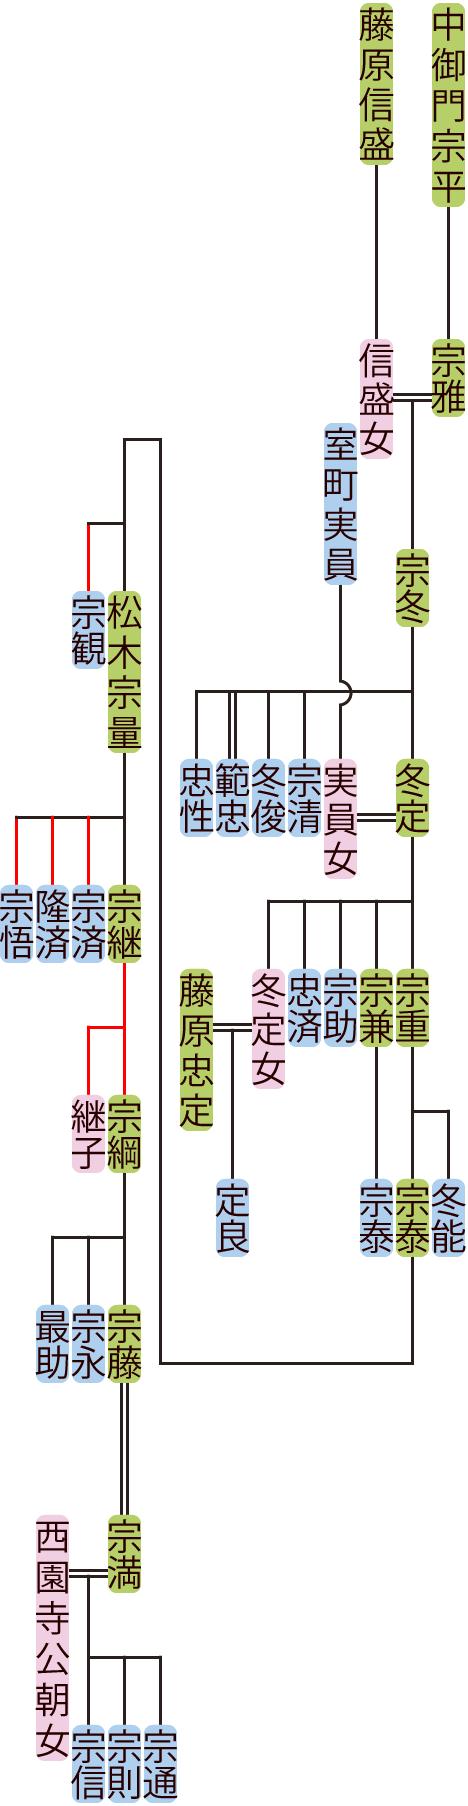 中御門宗冬~松木宗藤の系図